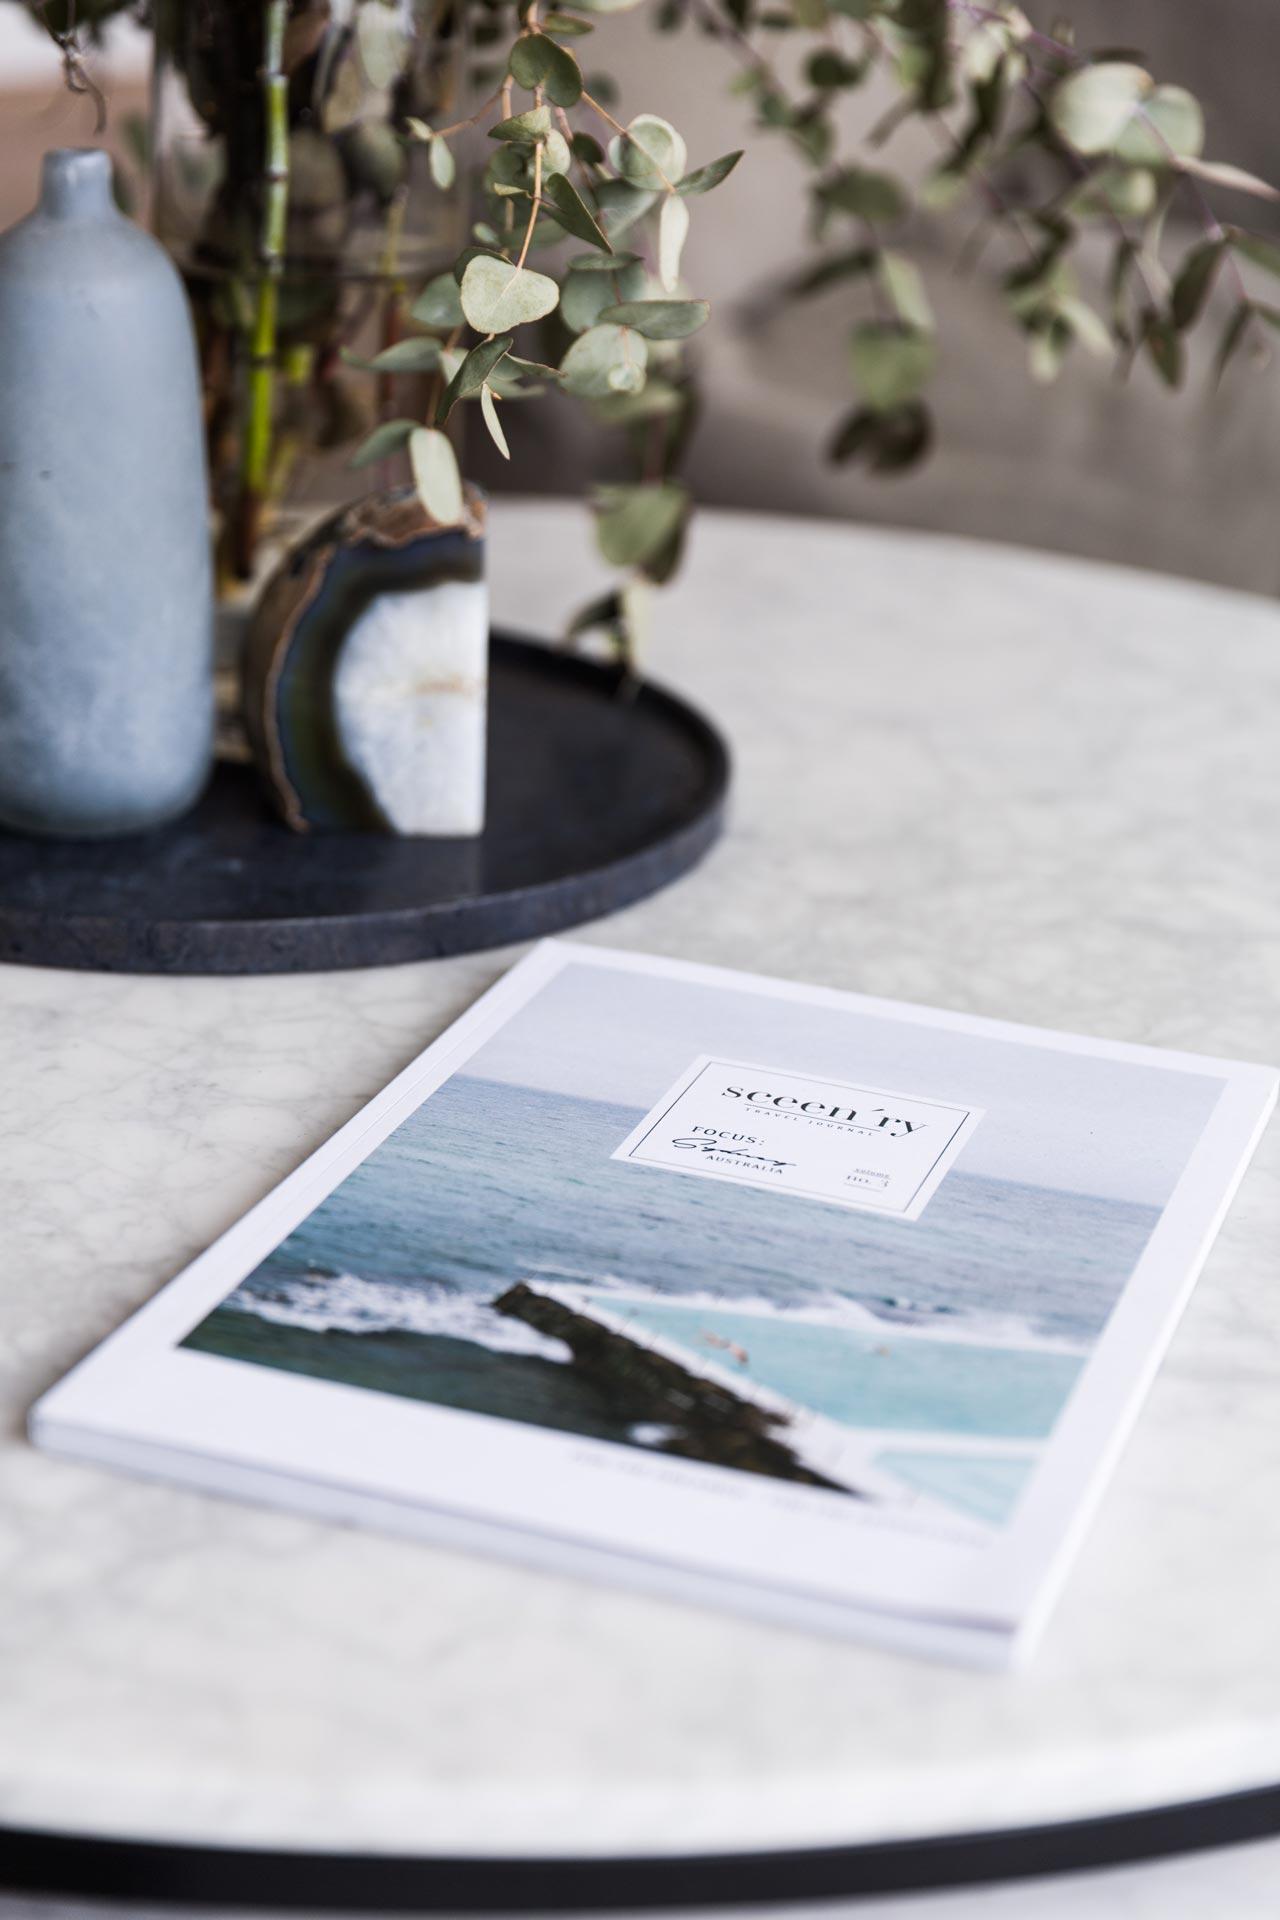 Sceen'ry Travel Journal